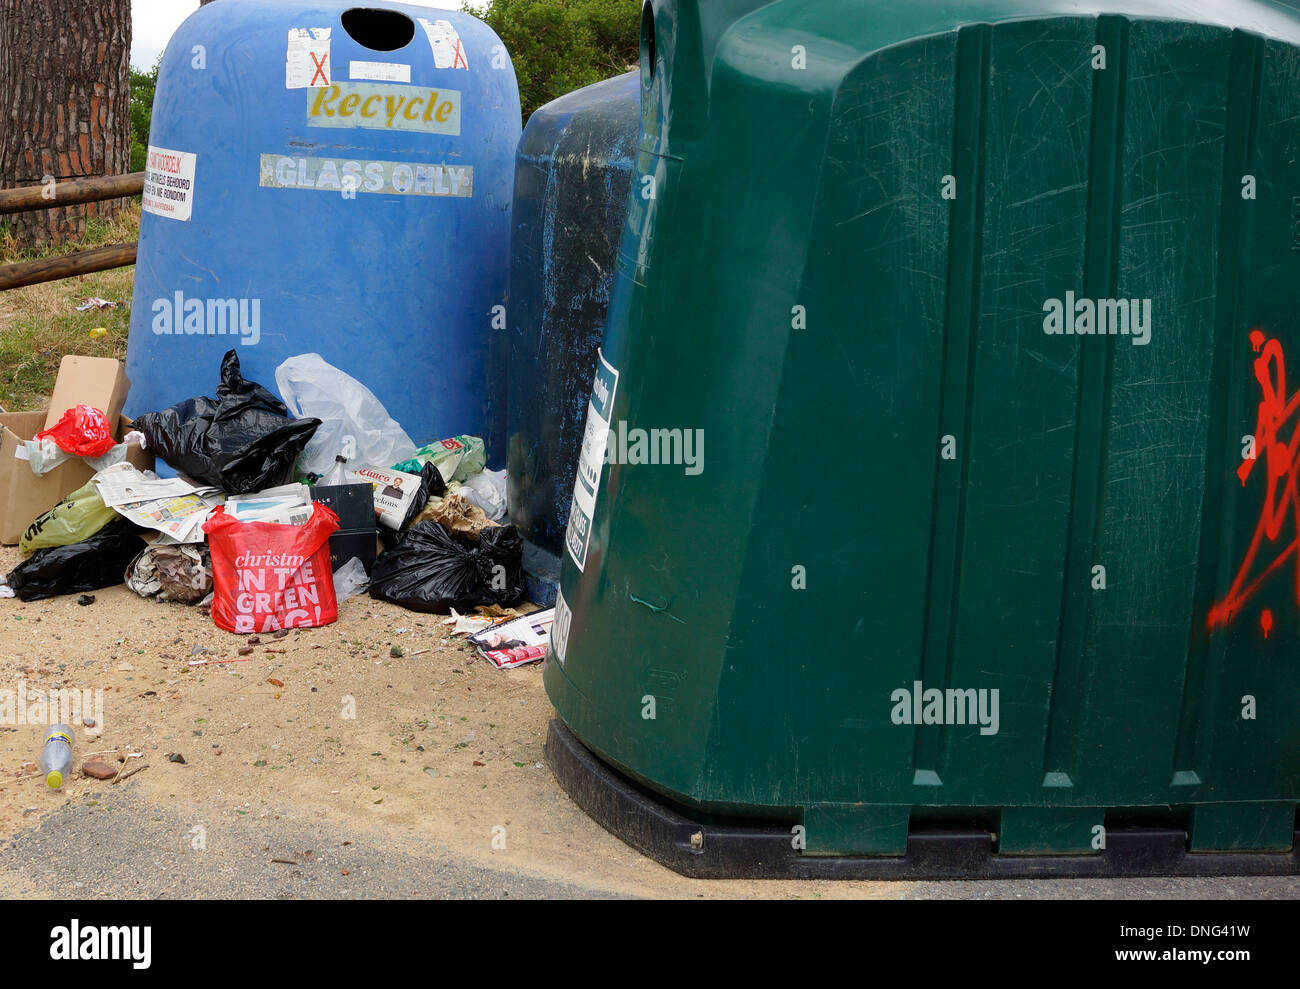 Mess at recycling depot. - Stock Image